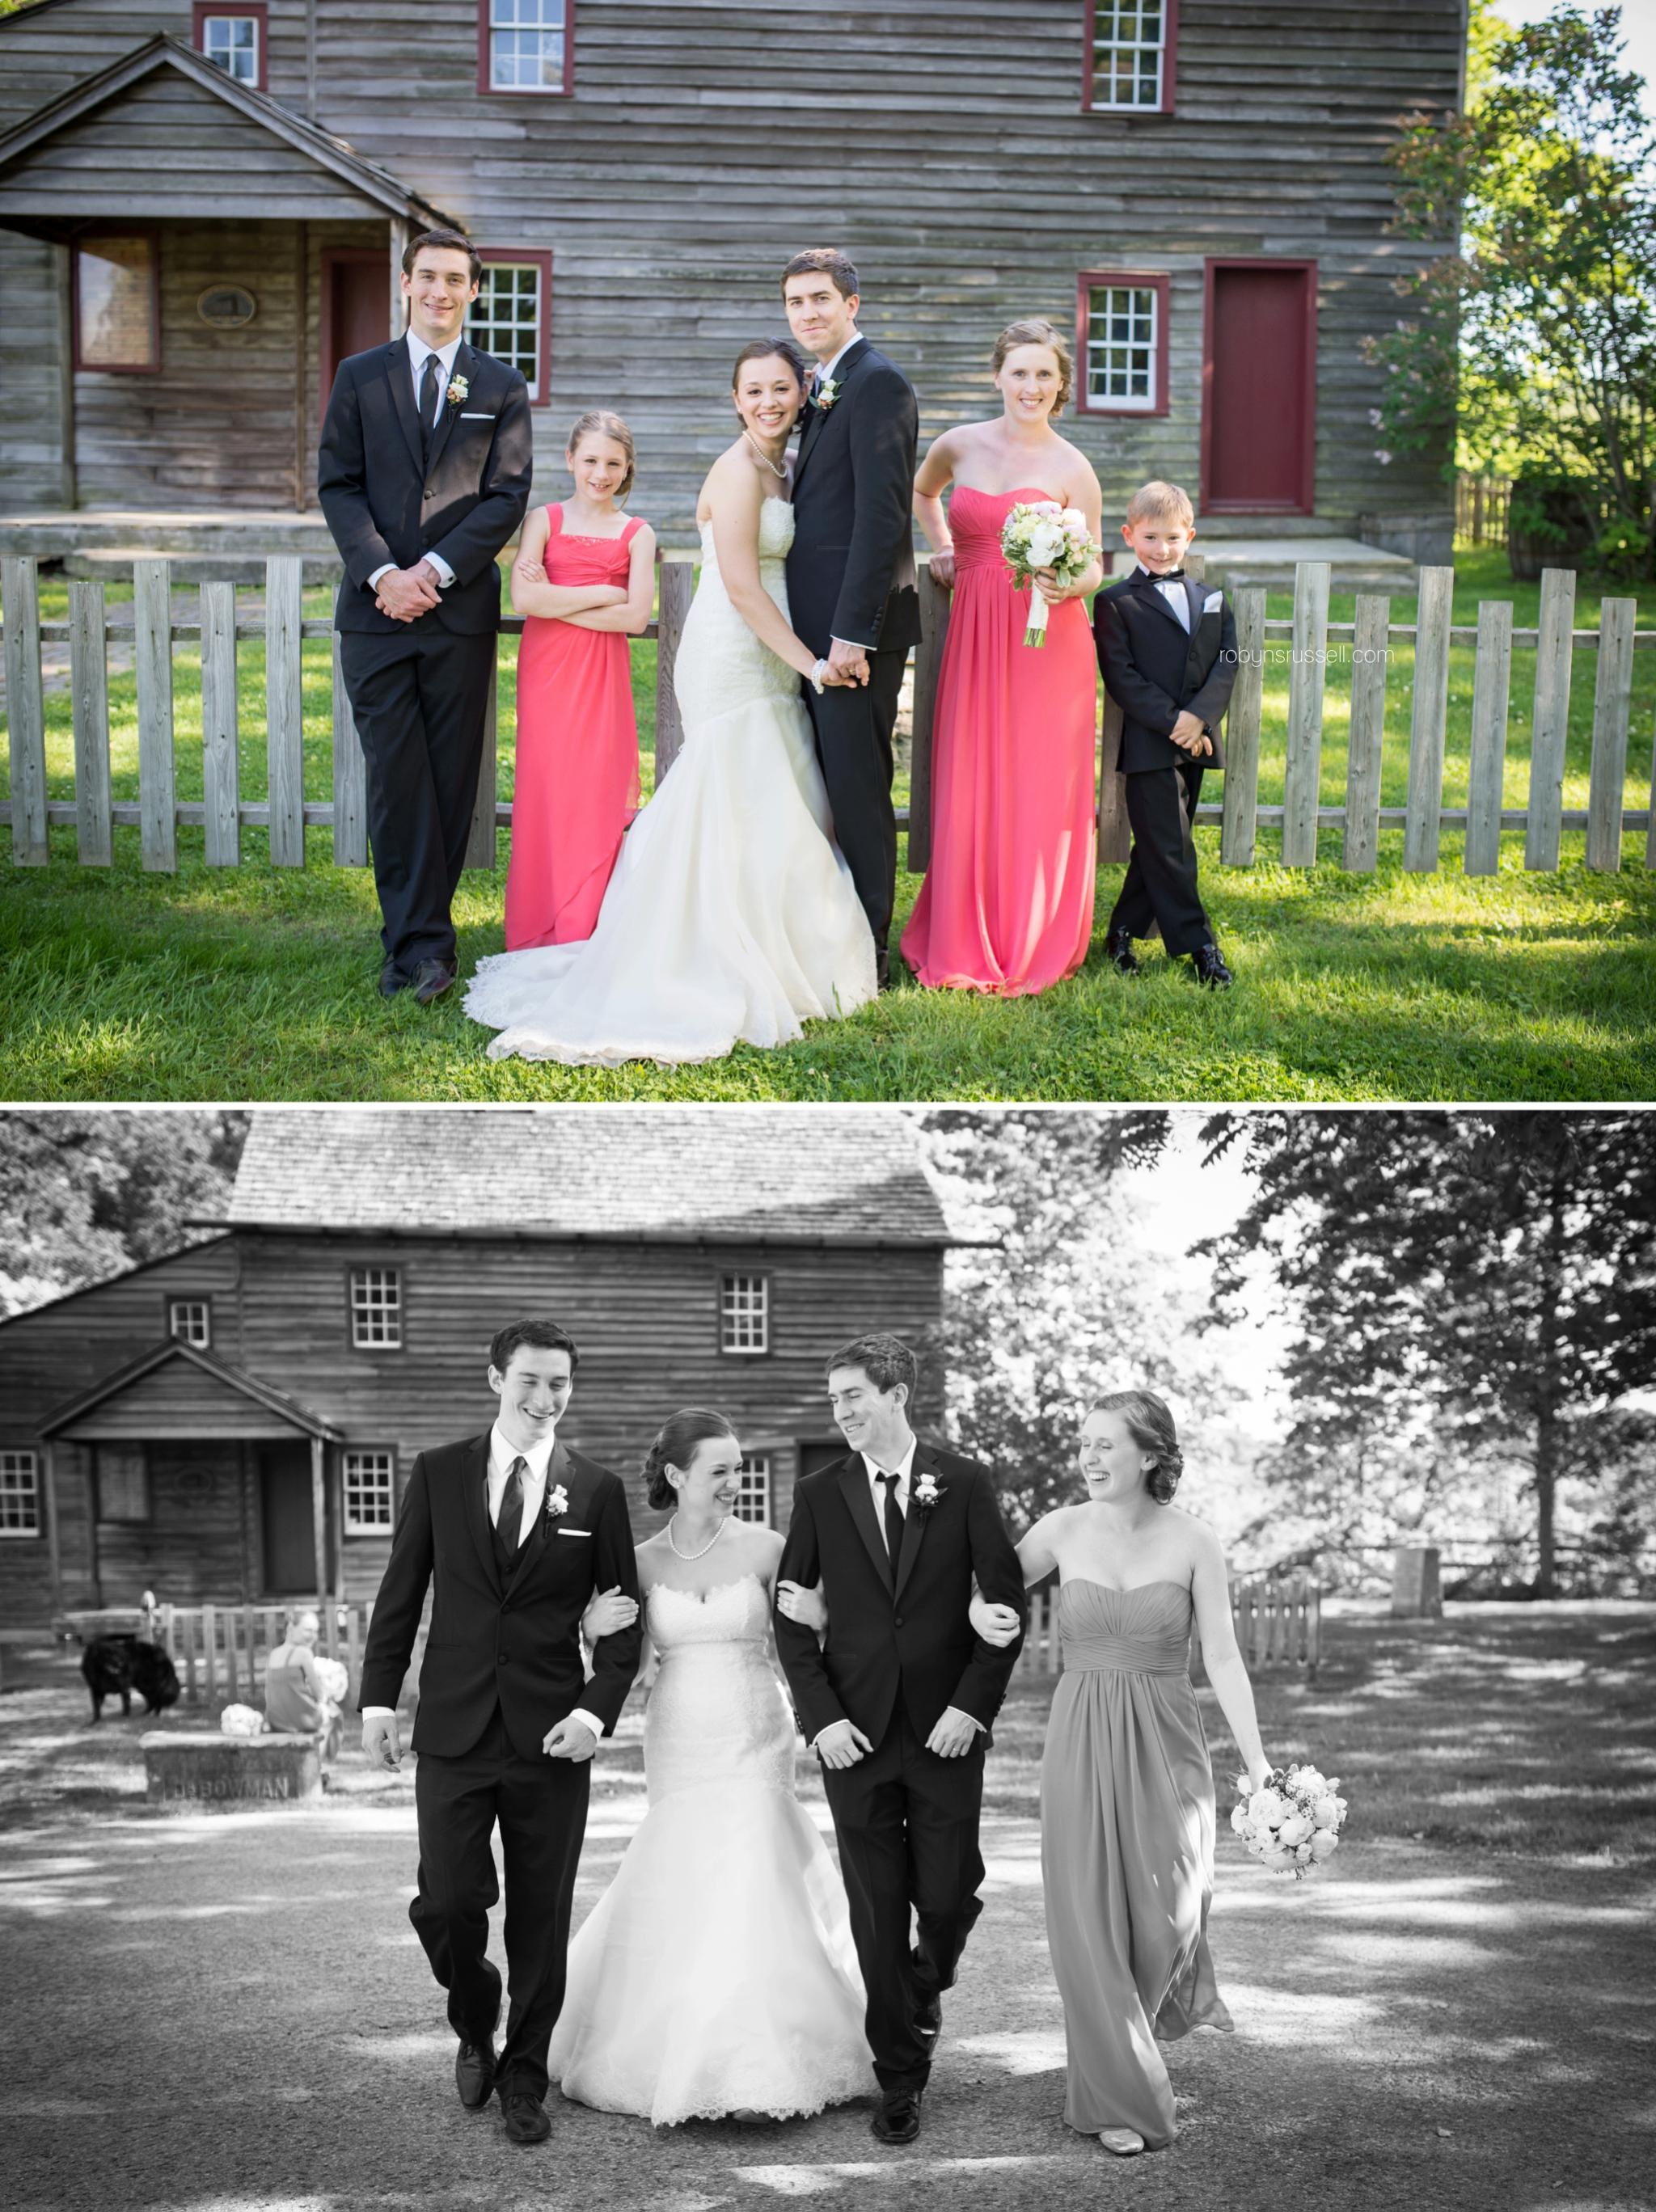 26-bridal-party-at-inn-on-the-twenty-ontario.jpg